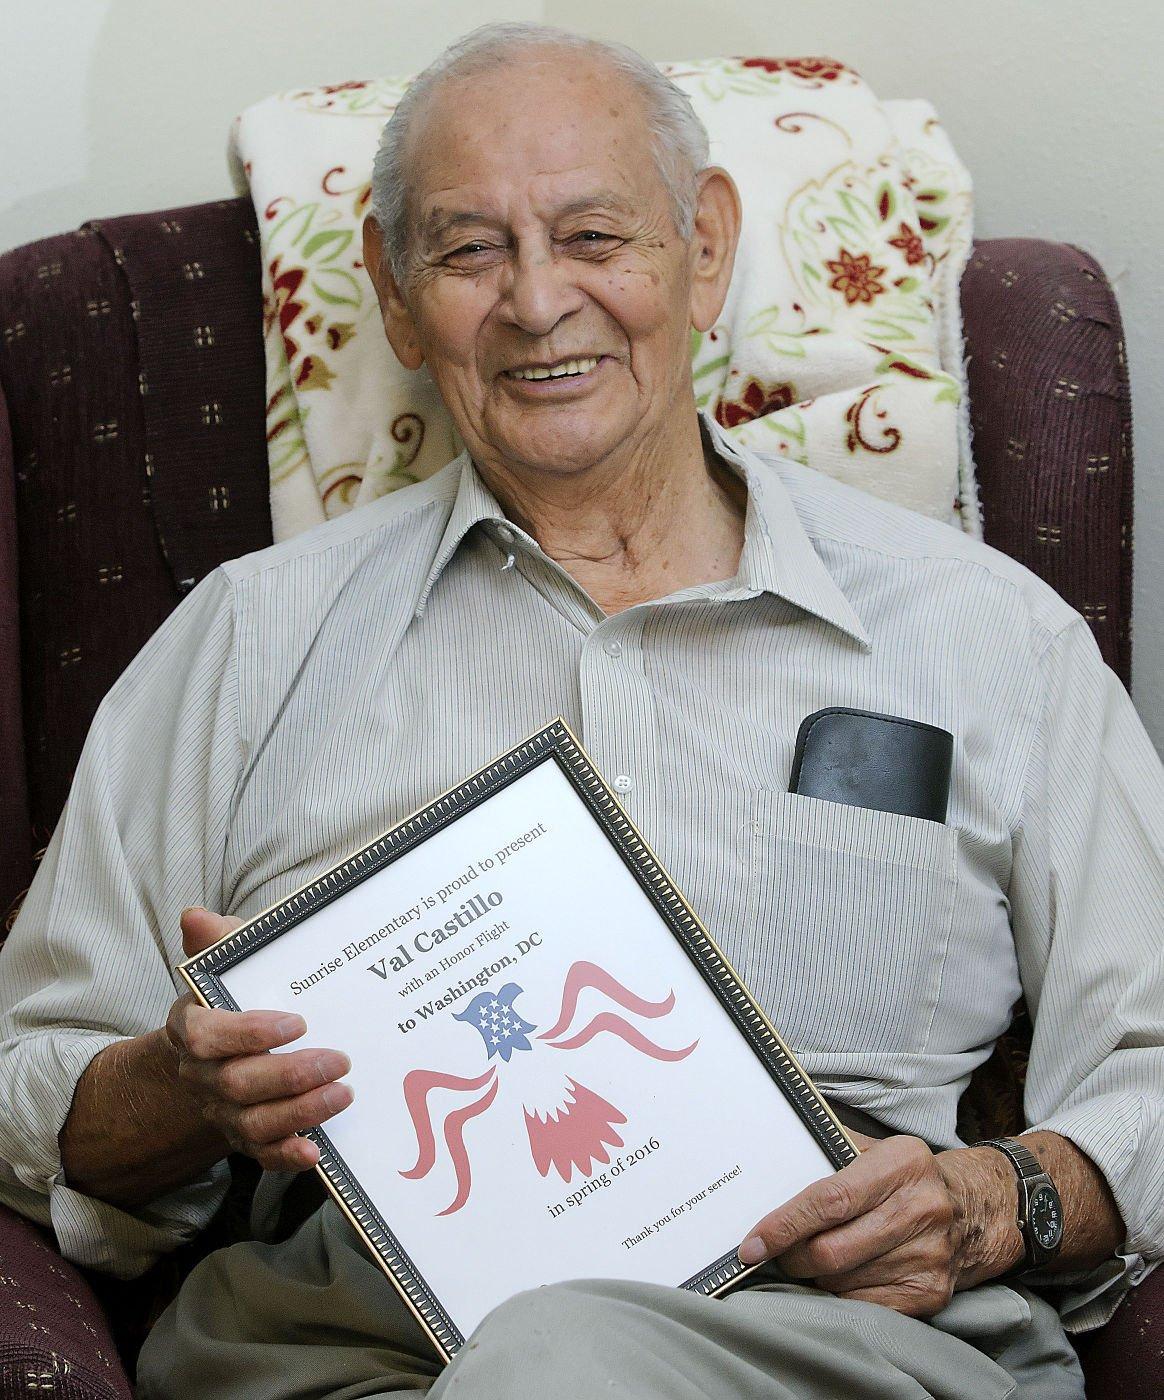 A joyful experience:' Smithfield WWII veteran returns from Utah